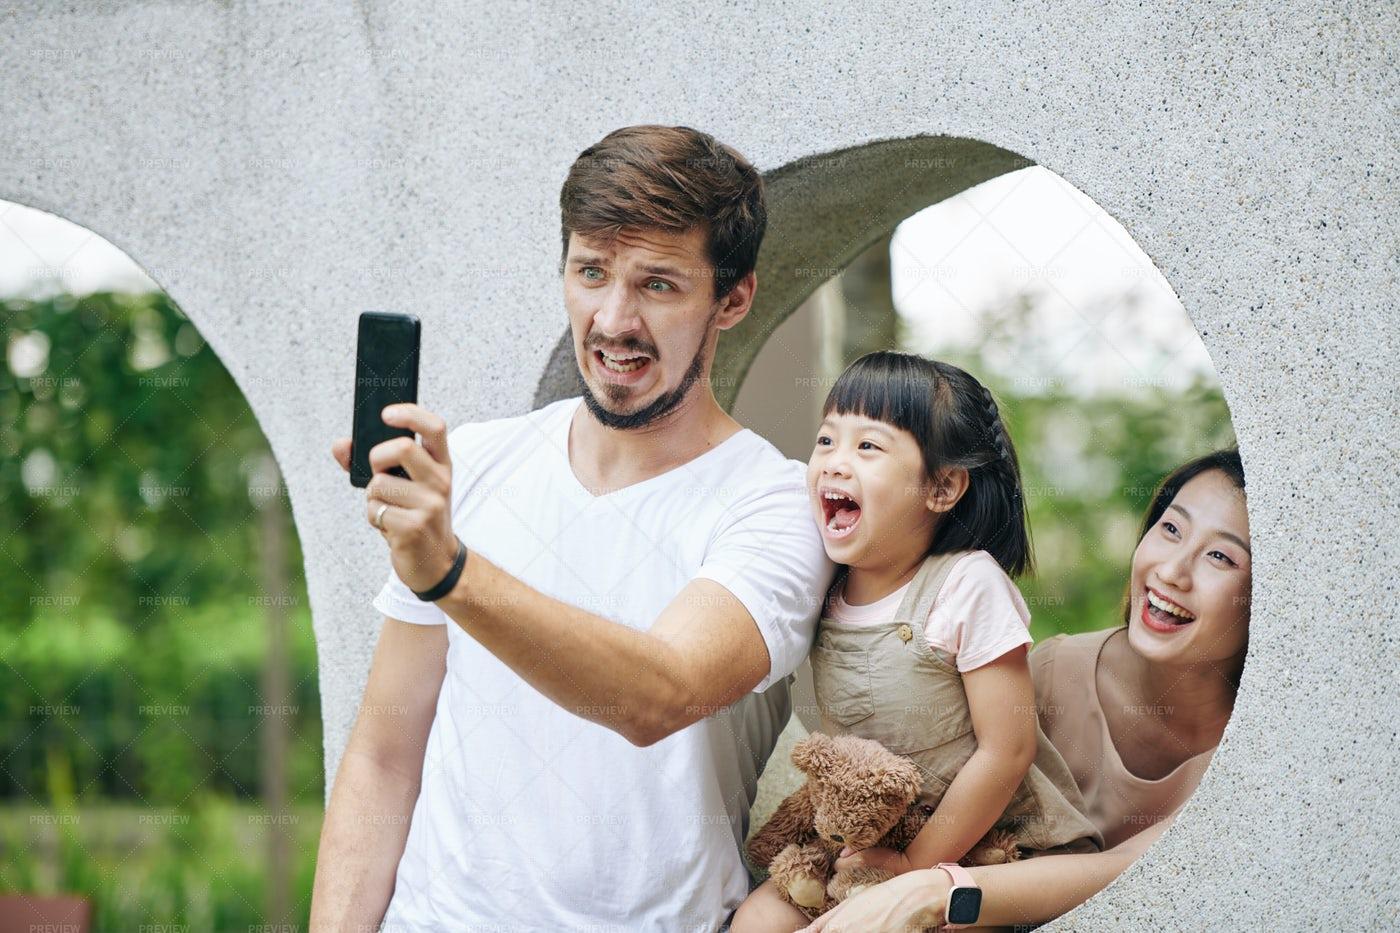 Family Taking Funny Photo: Stock Photos